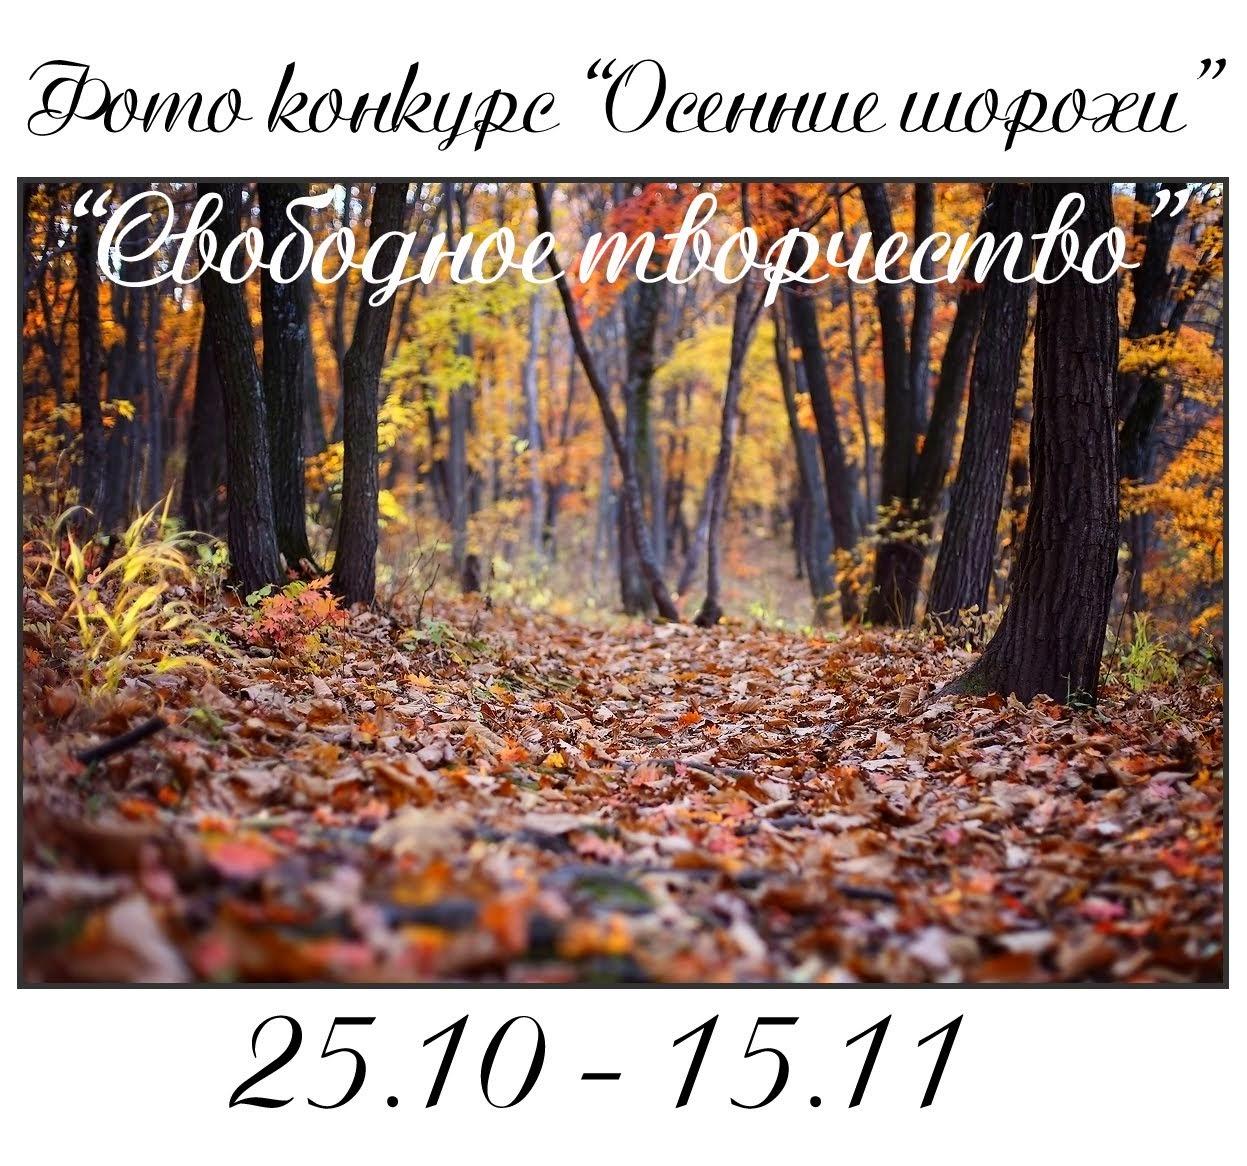 "Фото конкурс ""Осенние шорохи"""